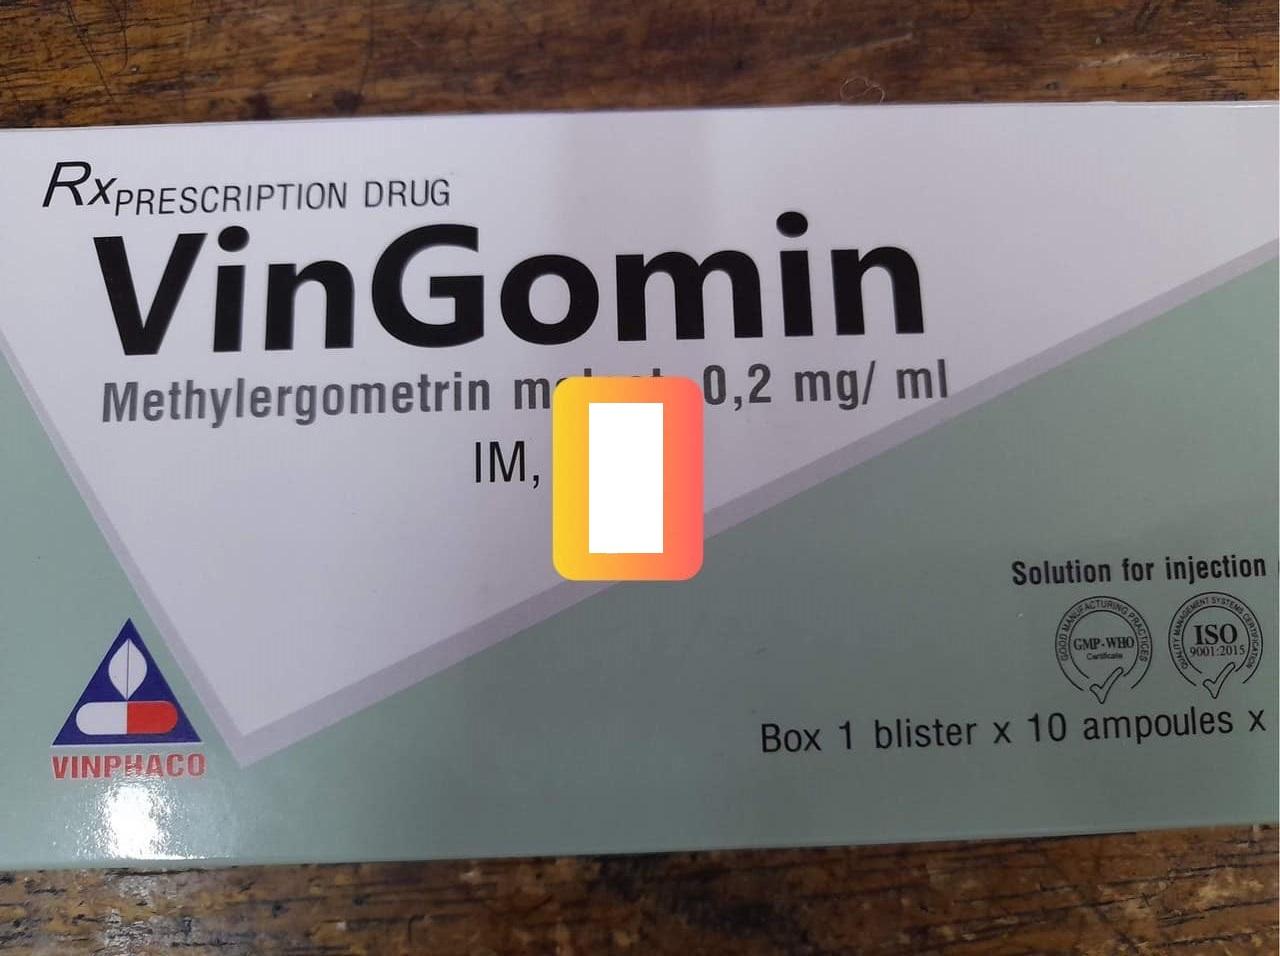 Vingomin 0.2mg/ml